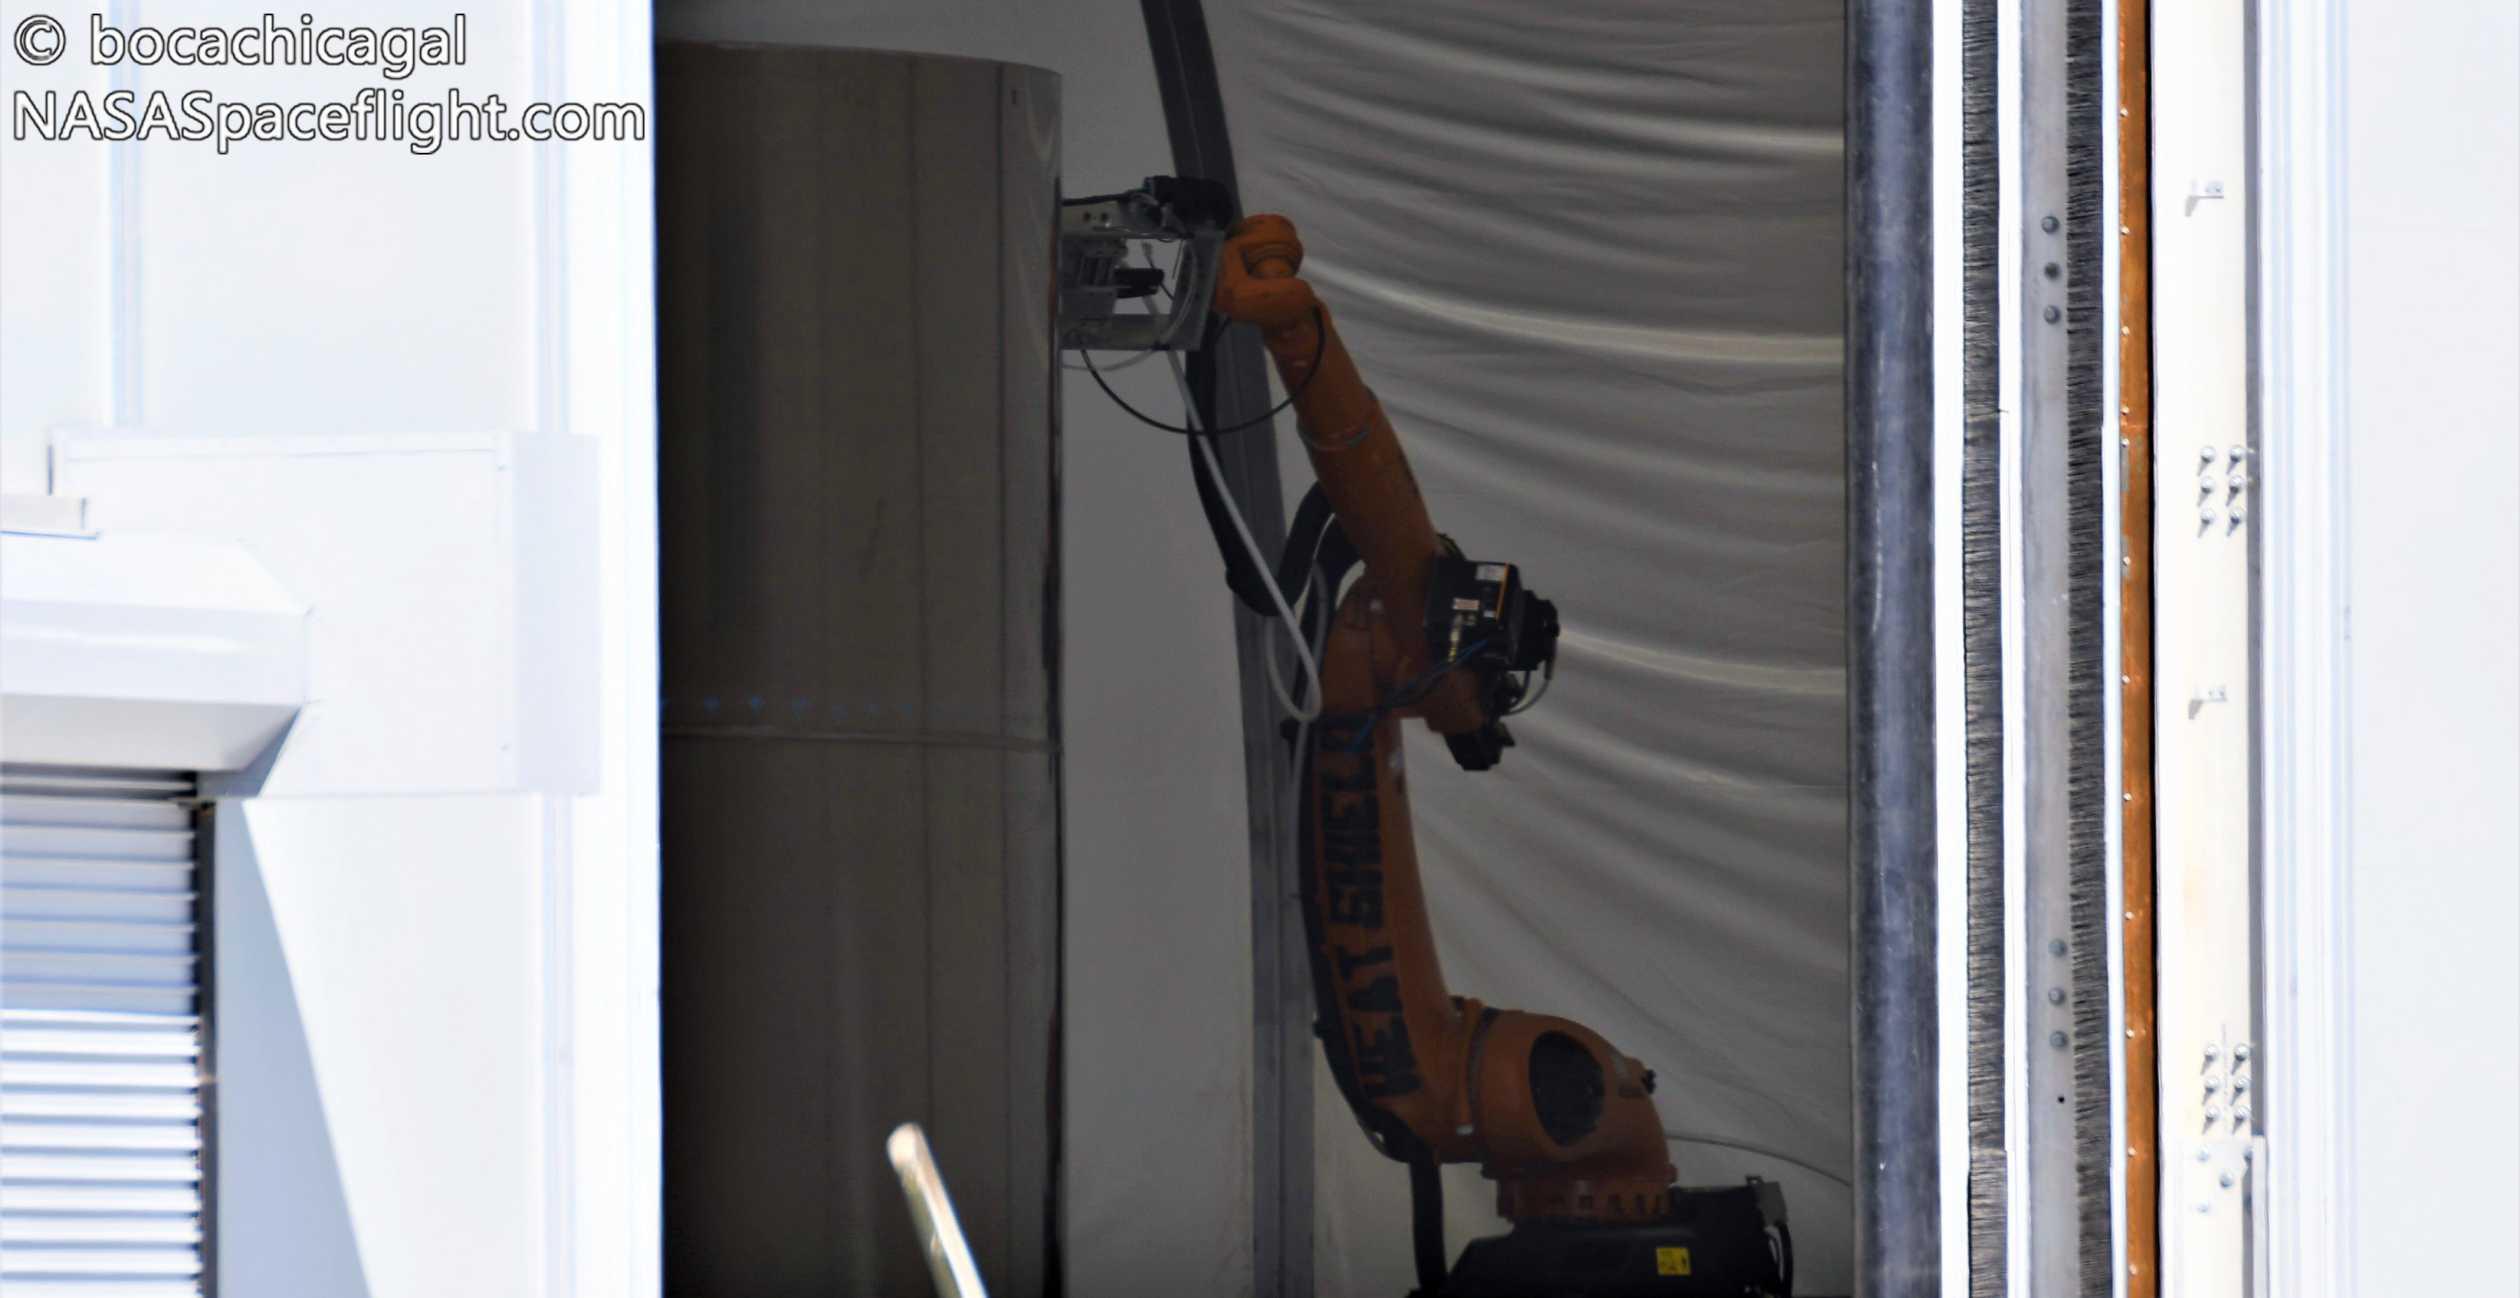 Starship Boca Chica 080520 (NASASpaceflight – bocachicagal) heat shield robot 1 crop (c)